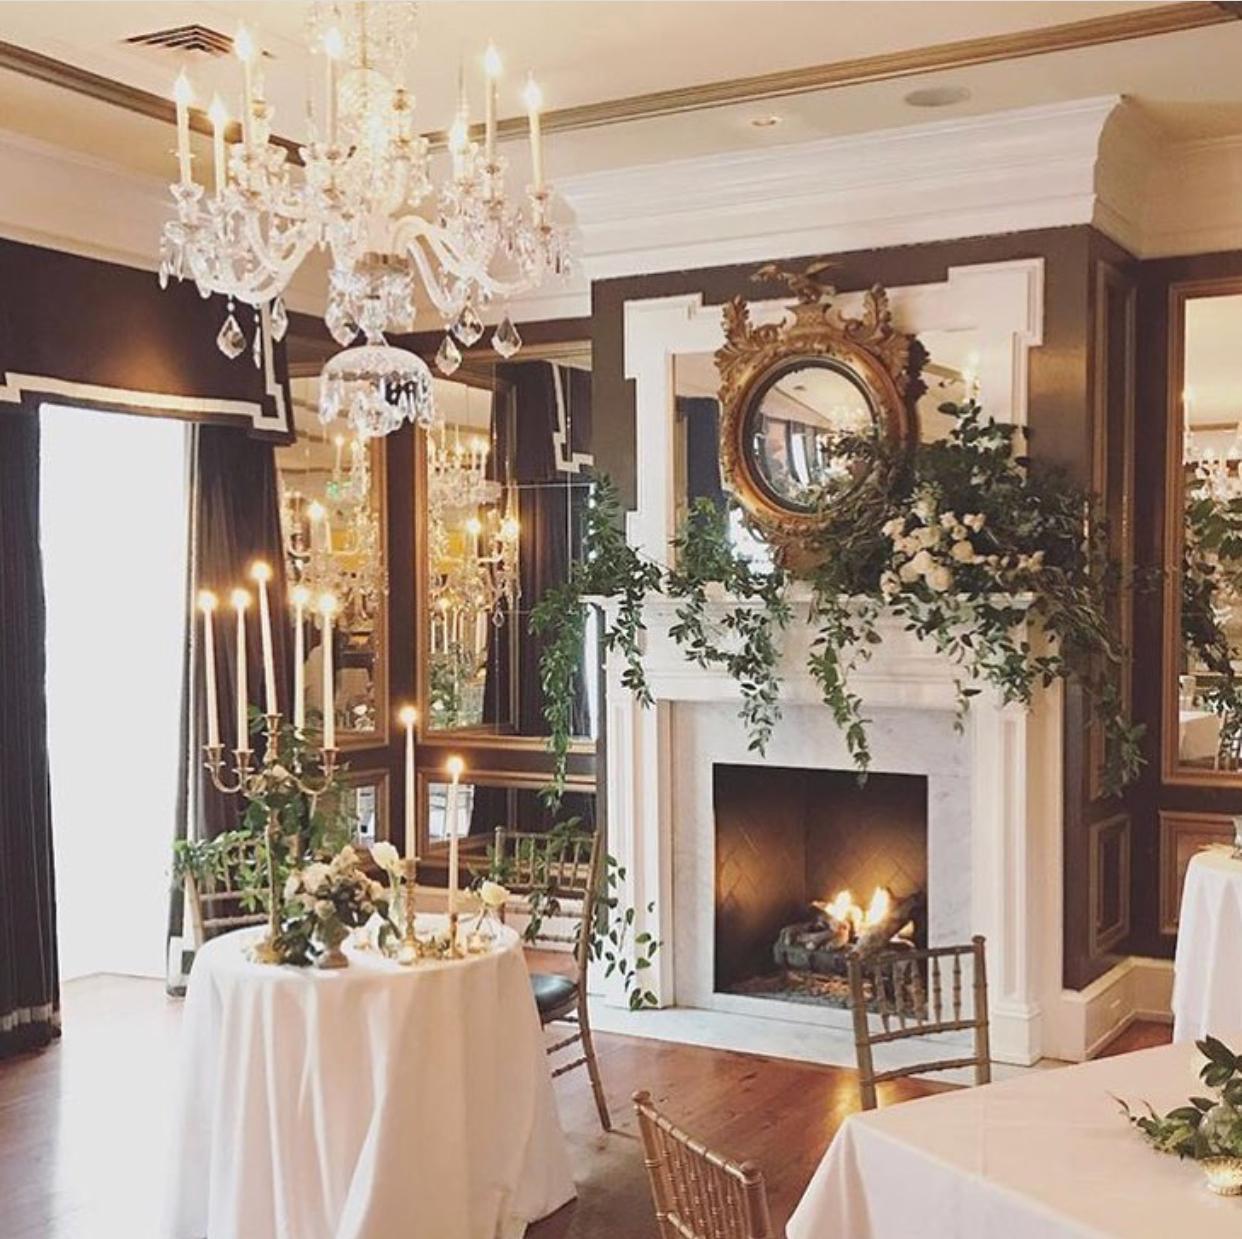 — PRIVATE EVENTS — - Weddings, Corporate, Lavish Parties...